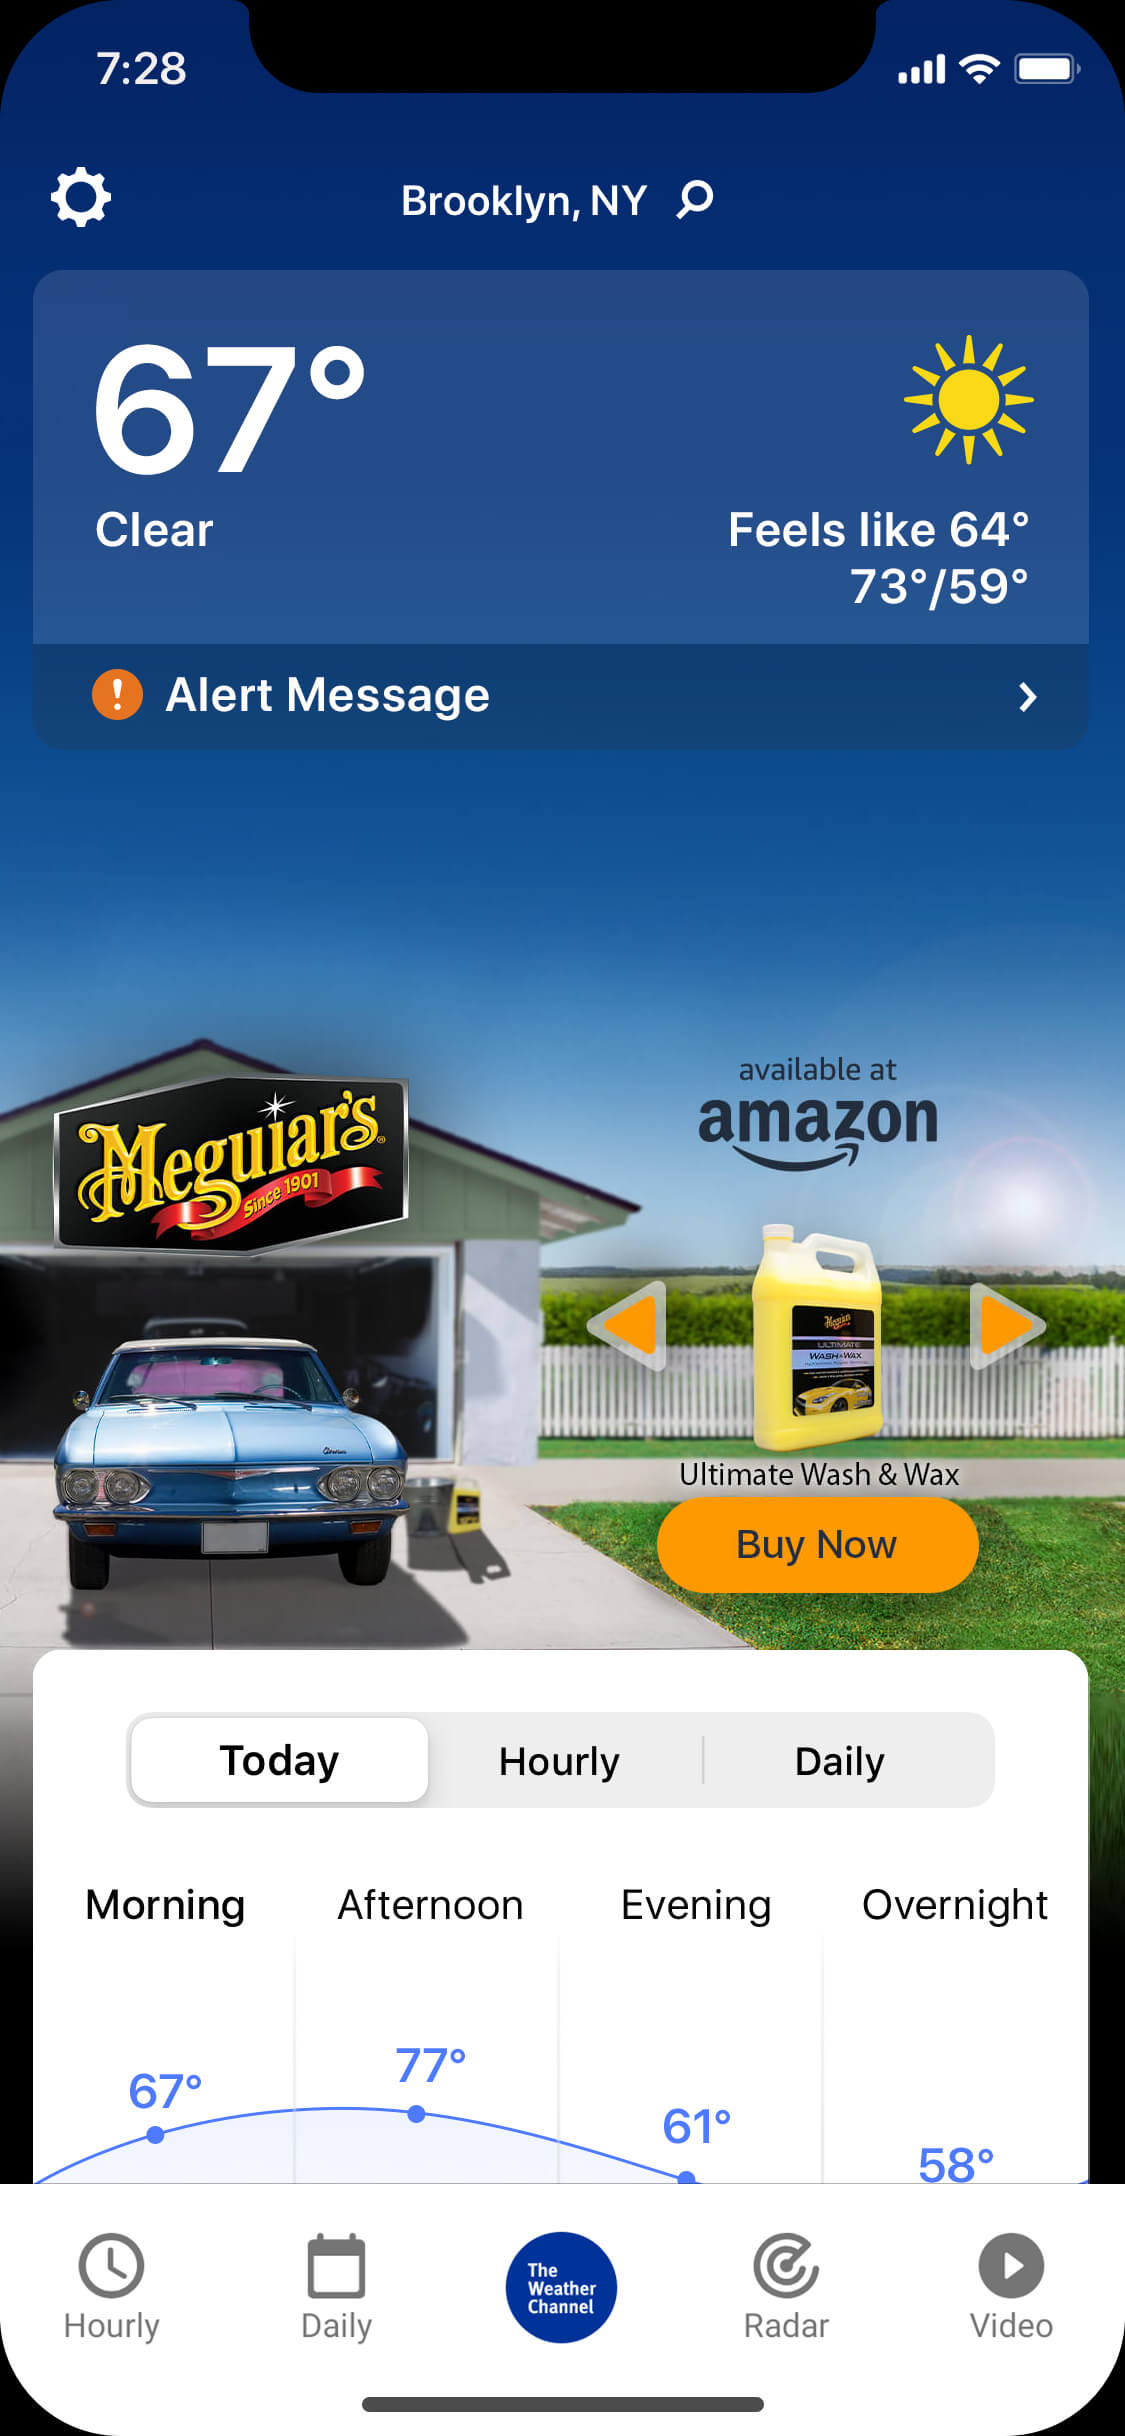 Amazon-Meguiar's-MAIM-Carousel_clear_day